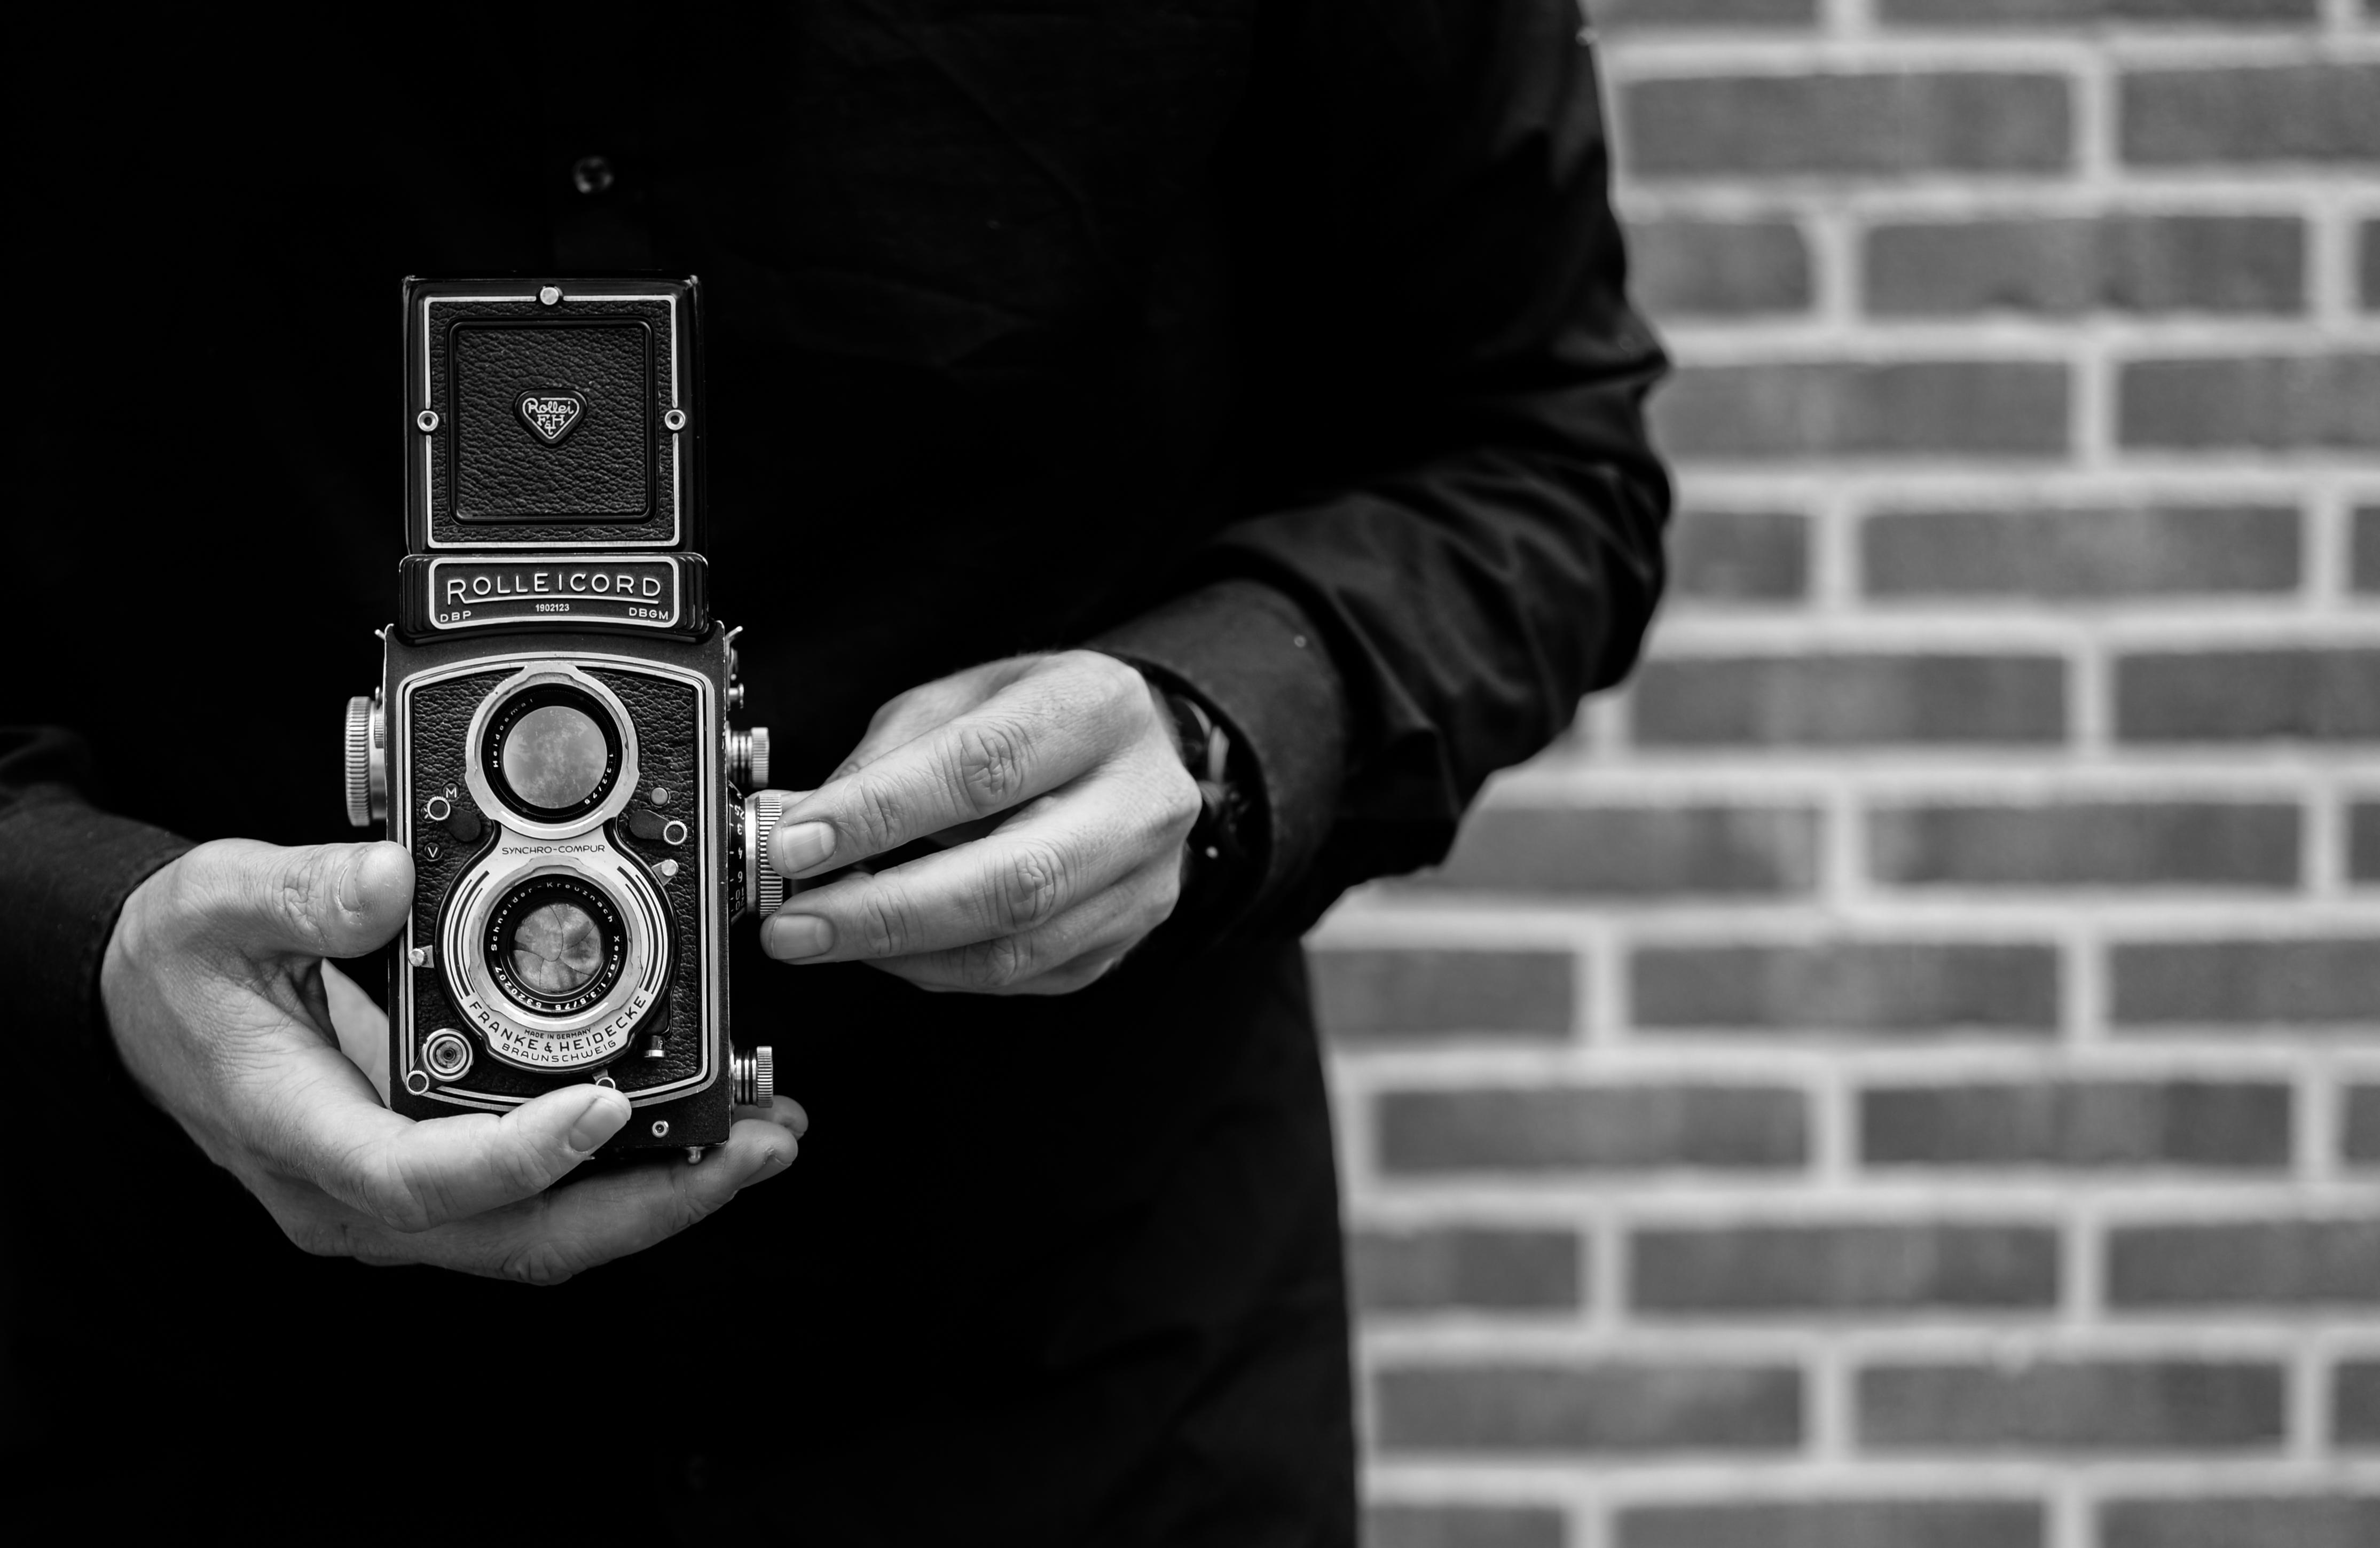 Rolleicord (Pic: Peter Heeling/Skitterphoto)